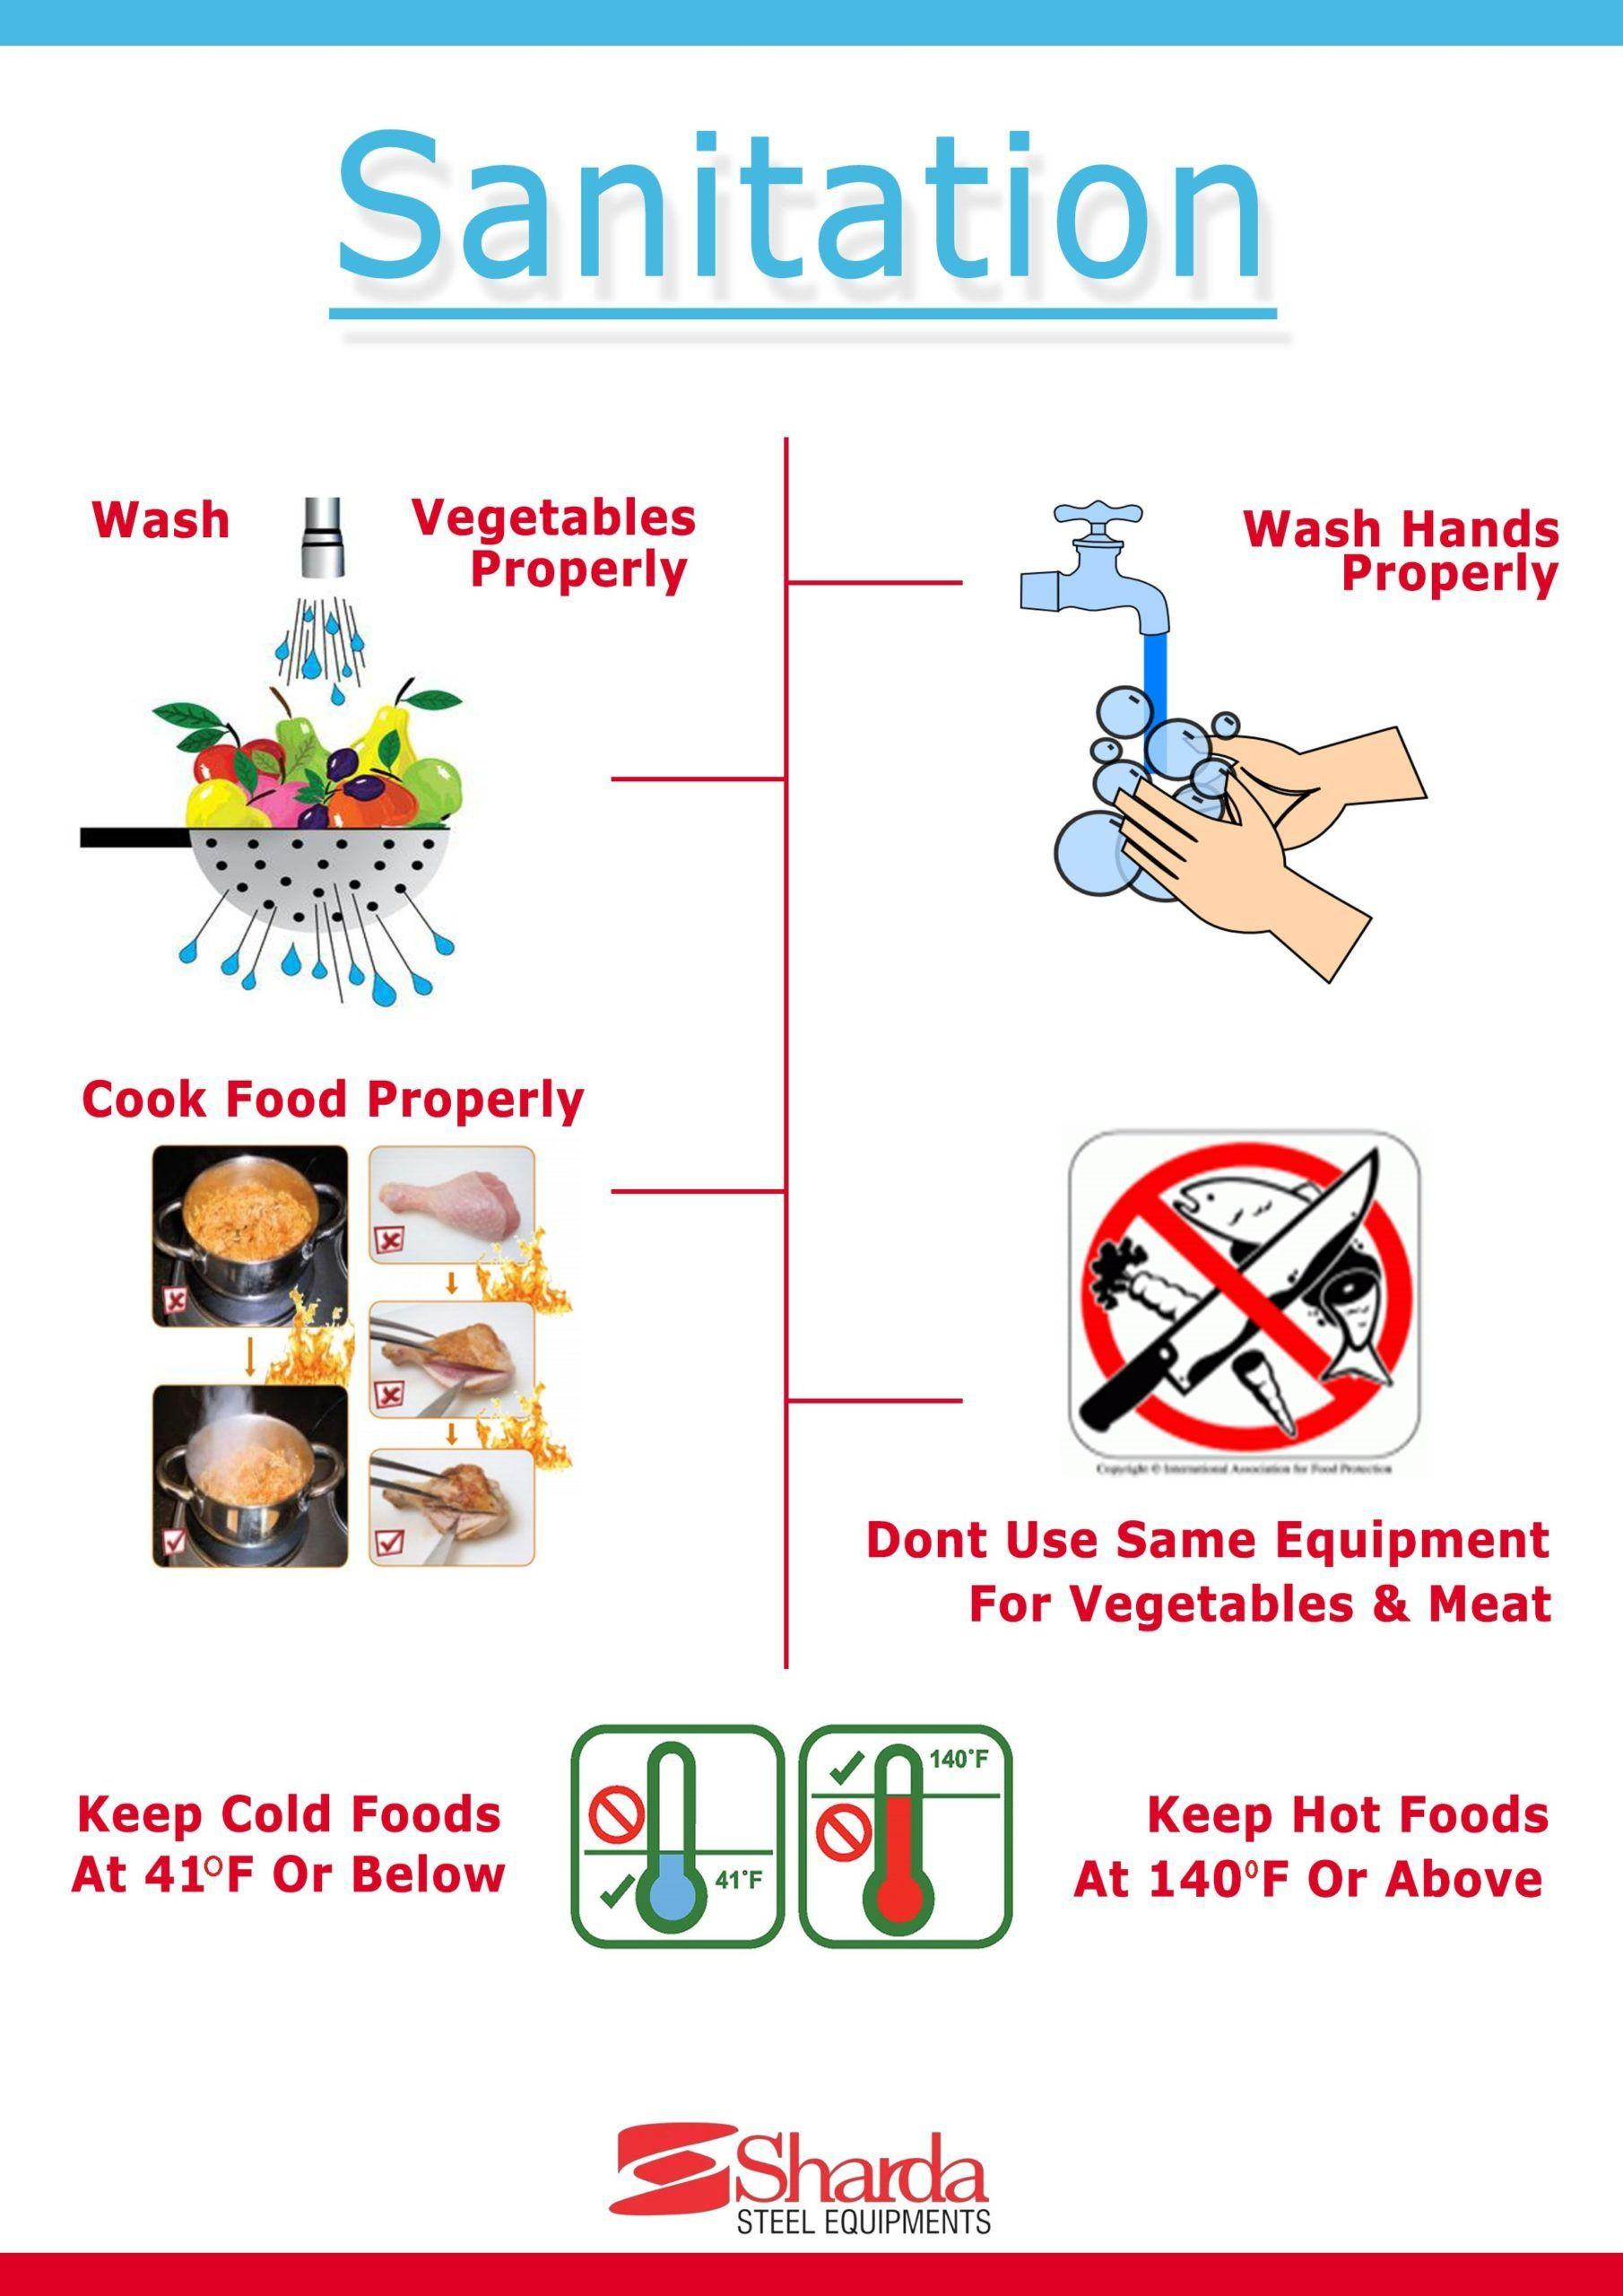 Kitchen Sanitation Tips By Sharda Steel Equipments